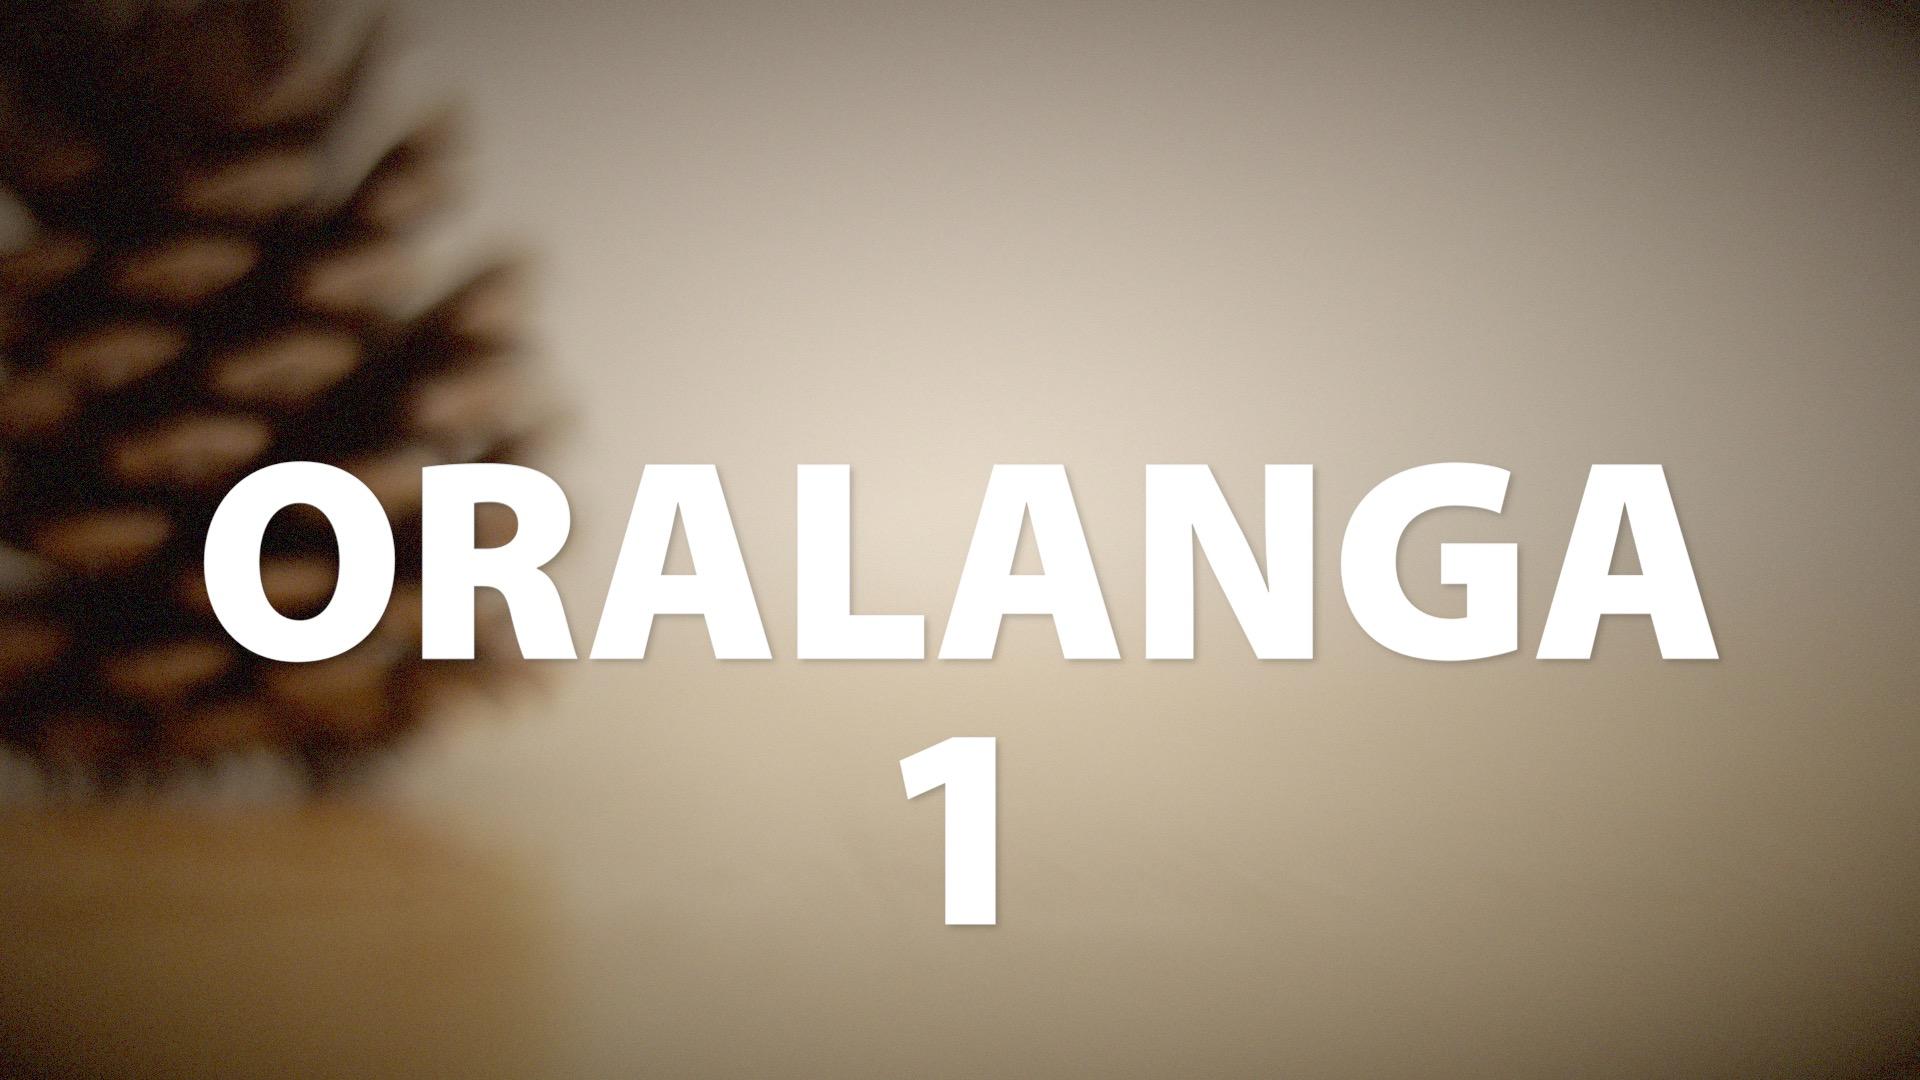 Oralanga 1